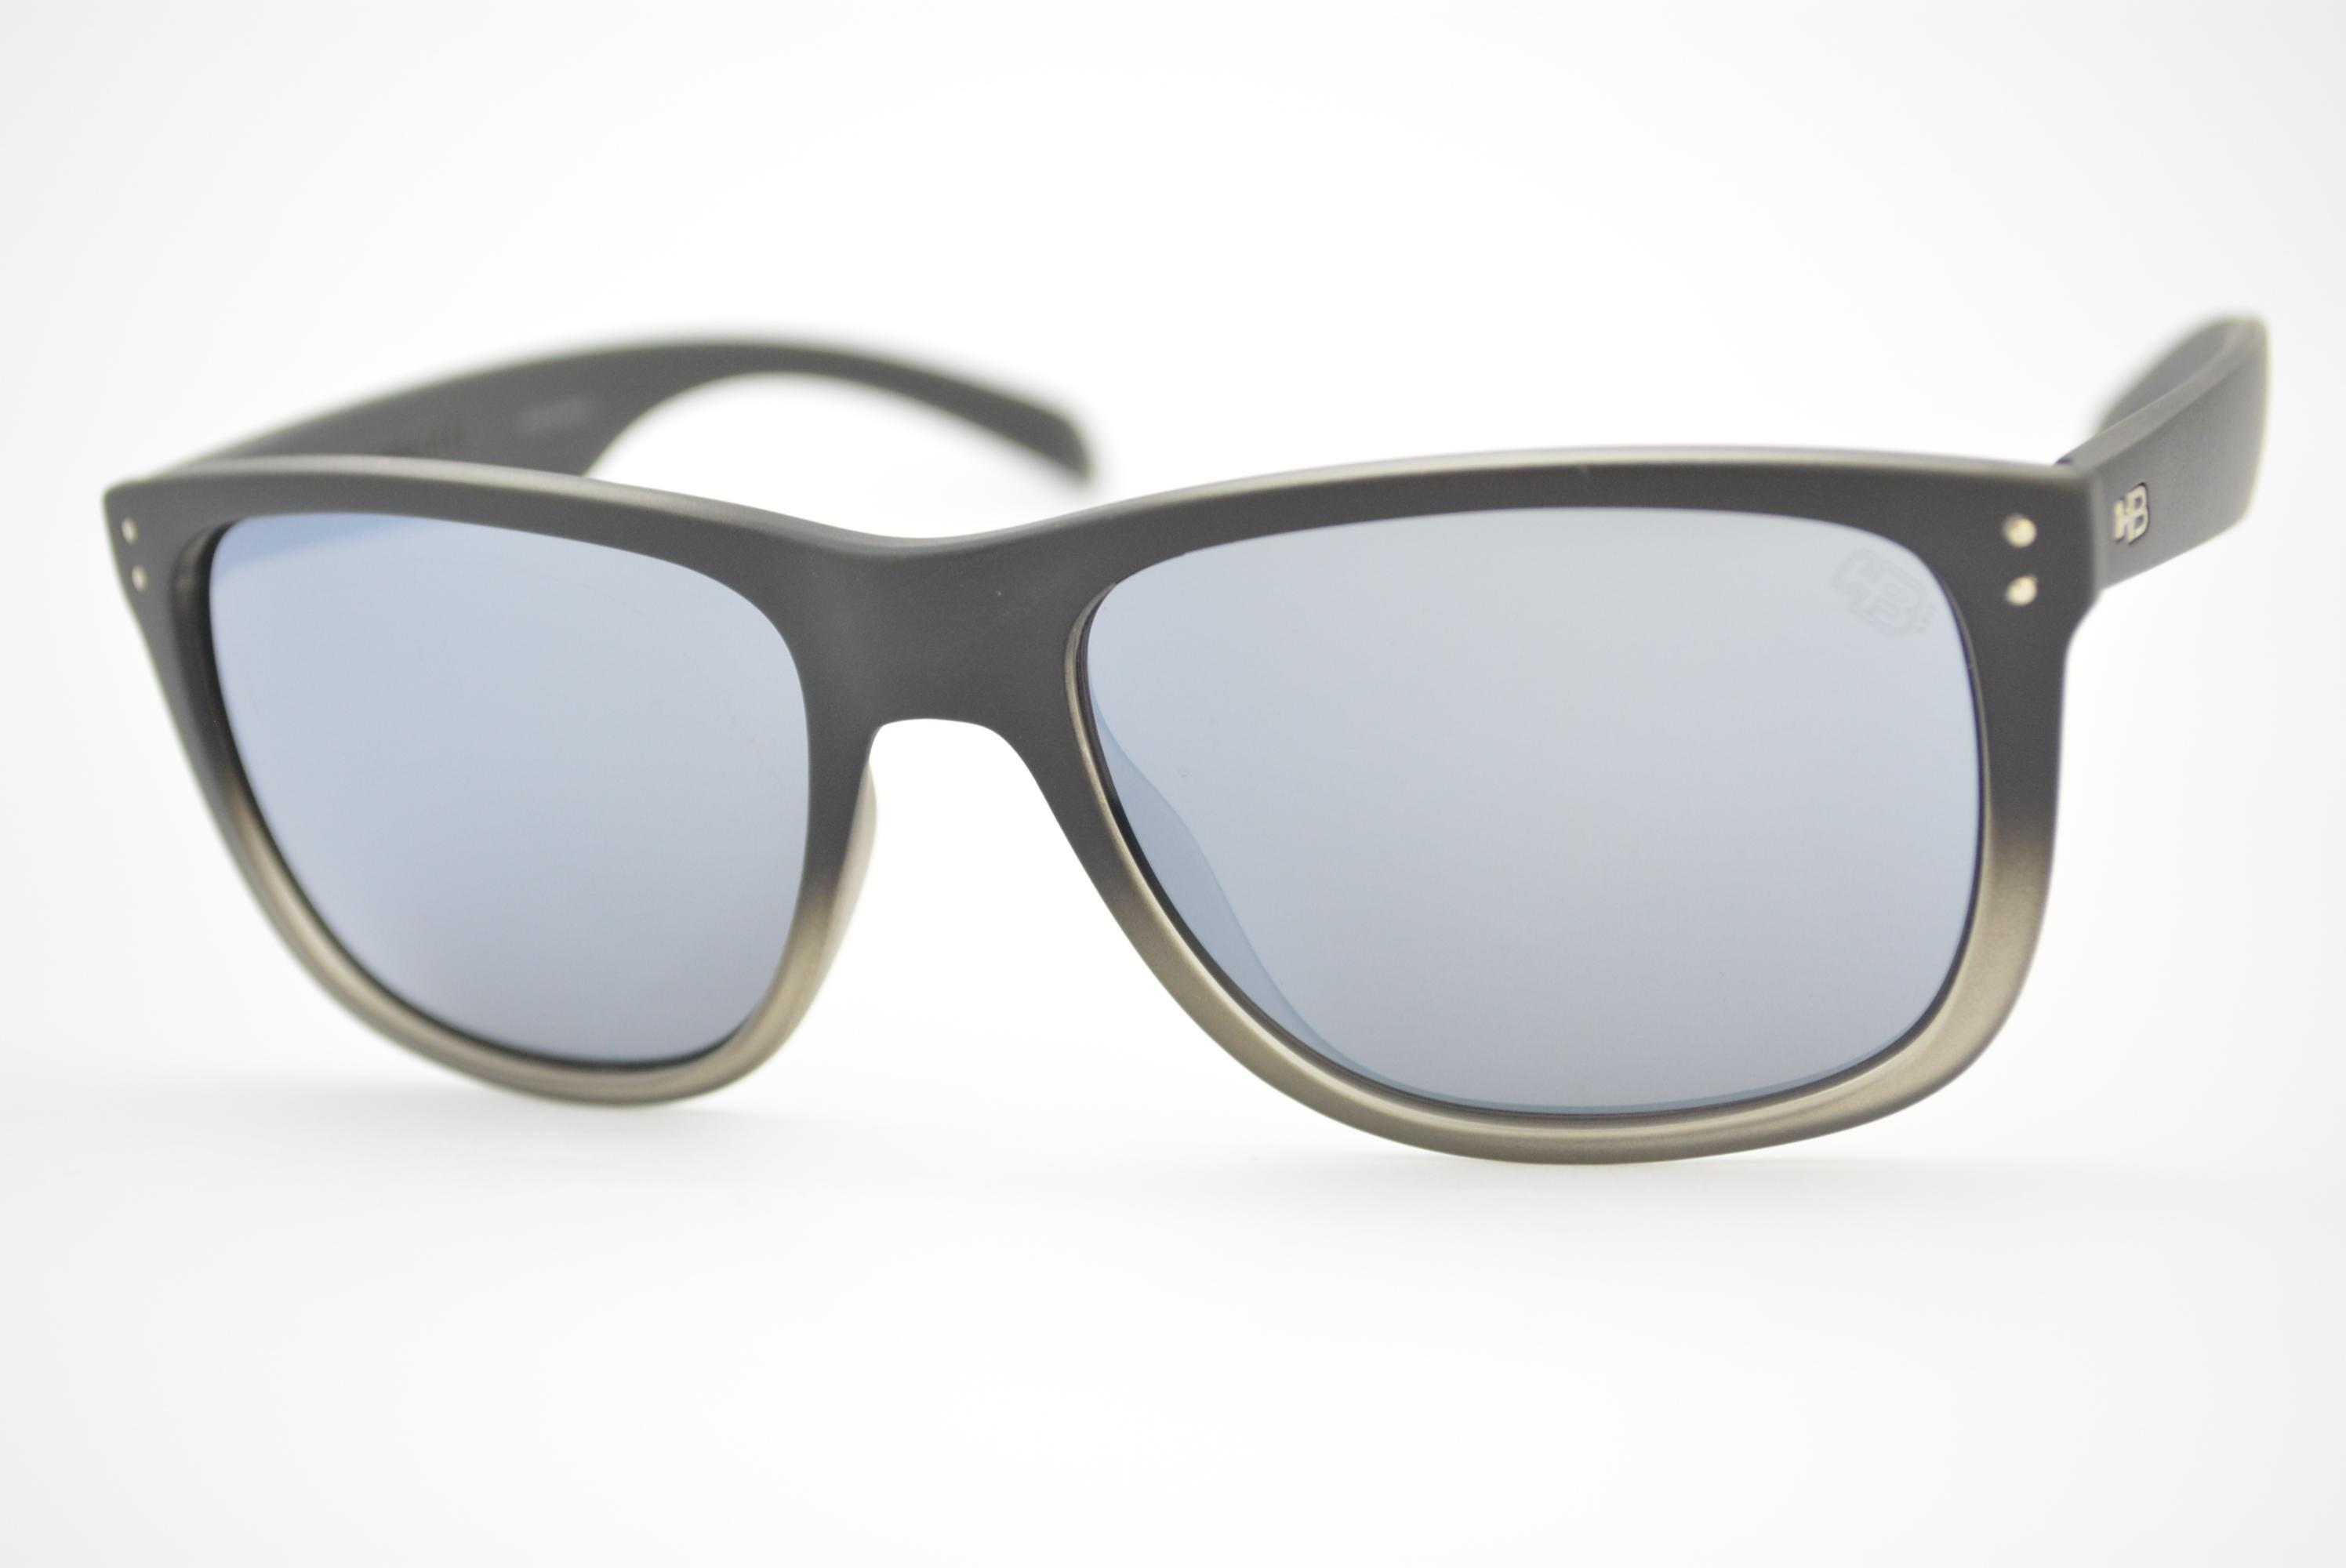 34a7f4198 ... óculos de sol HB mod Ozzie matte fade silver 90140869 ...